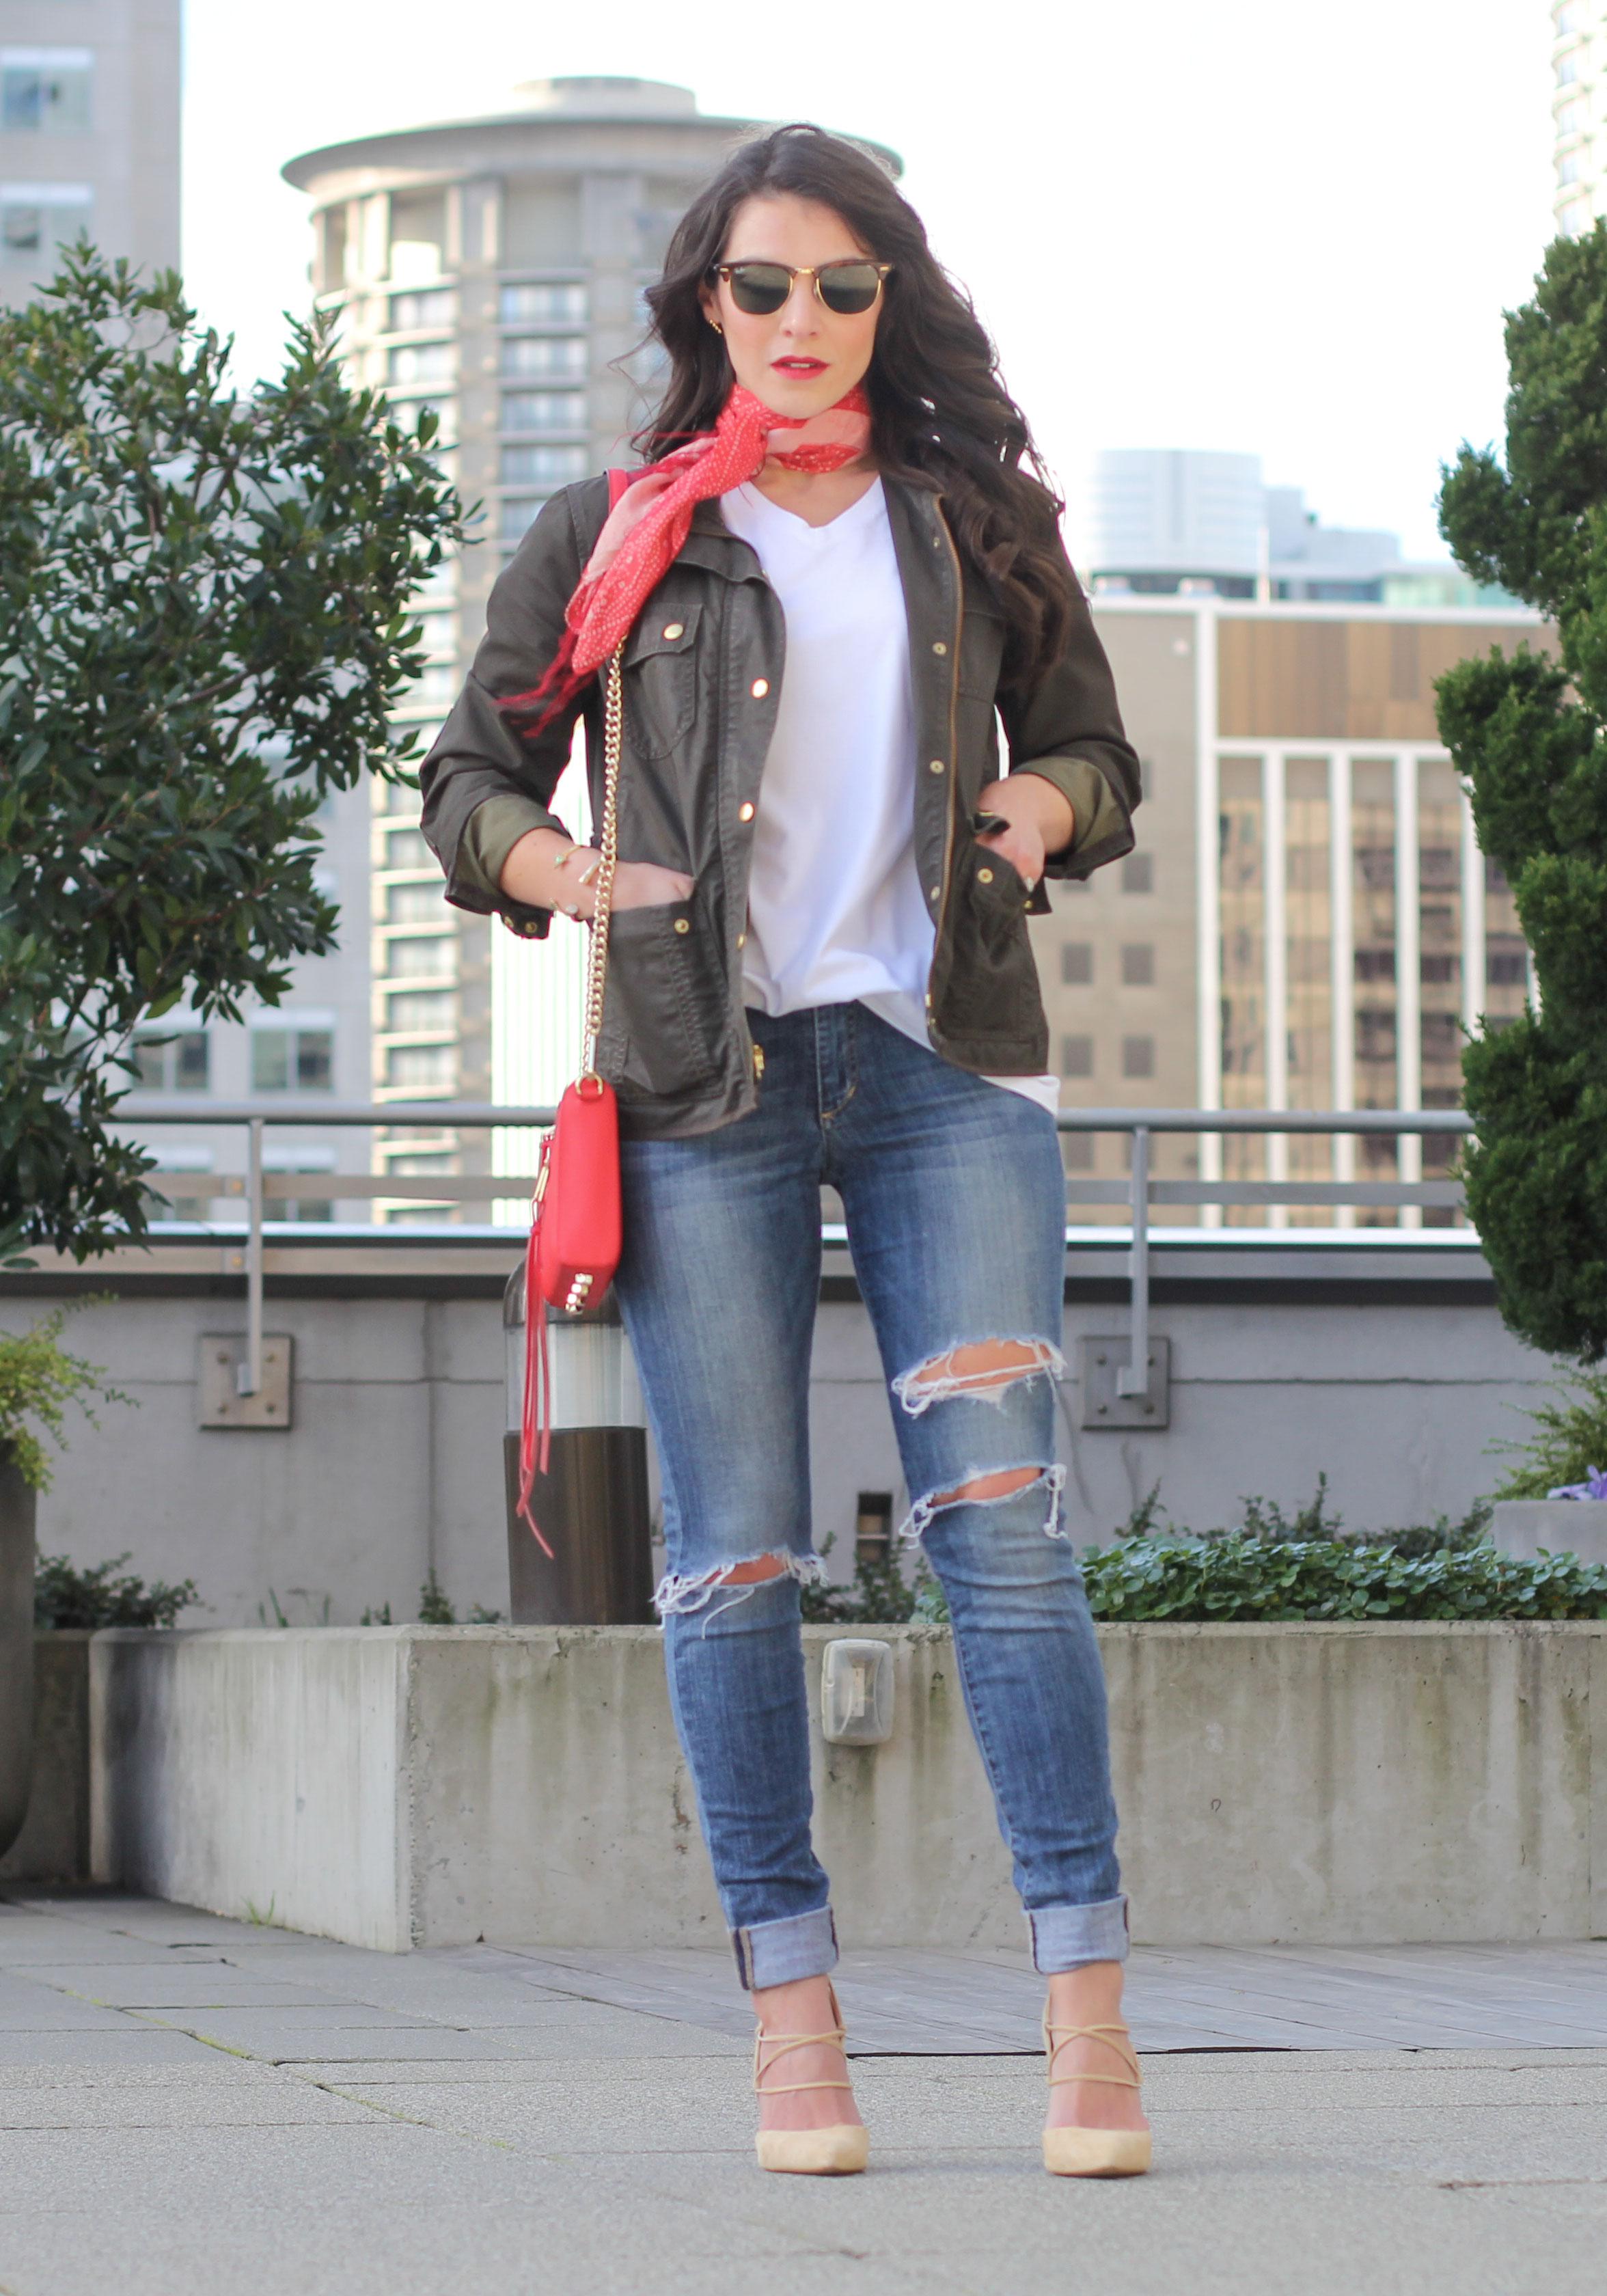 Shop His Closet: How to wear a boyfriend tee, Red Scarf, J.Crew Downtown Field Jacket, Sam Edelman 'Dayna' Pumps, Rebecca Minkoff Avery Crossbody